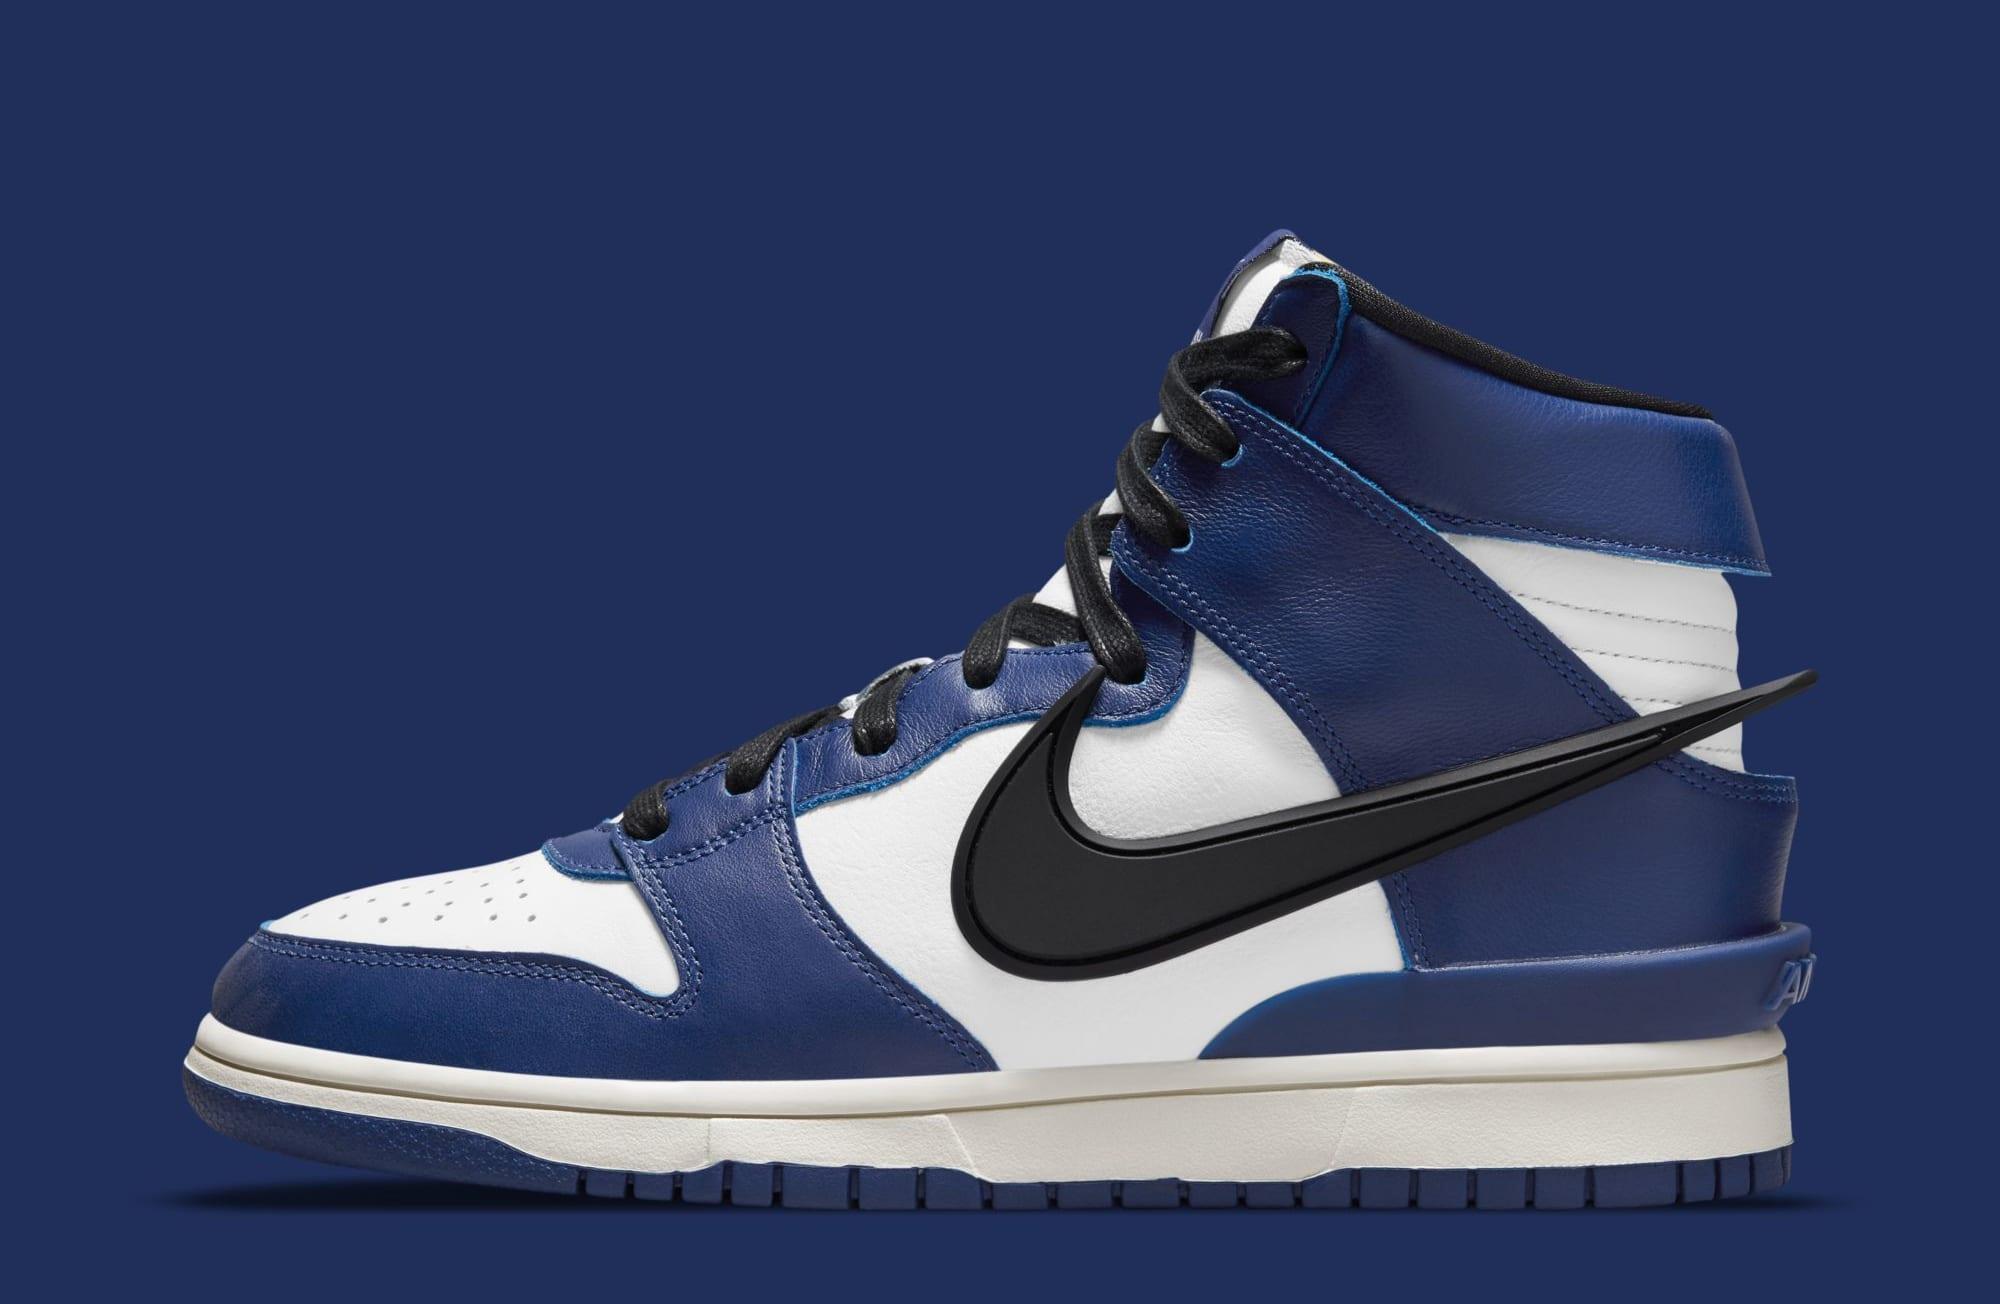 Ambush x Nike Dunk High 'Deep Royal Blue' CU7544-400 (Lateral)